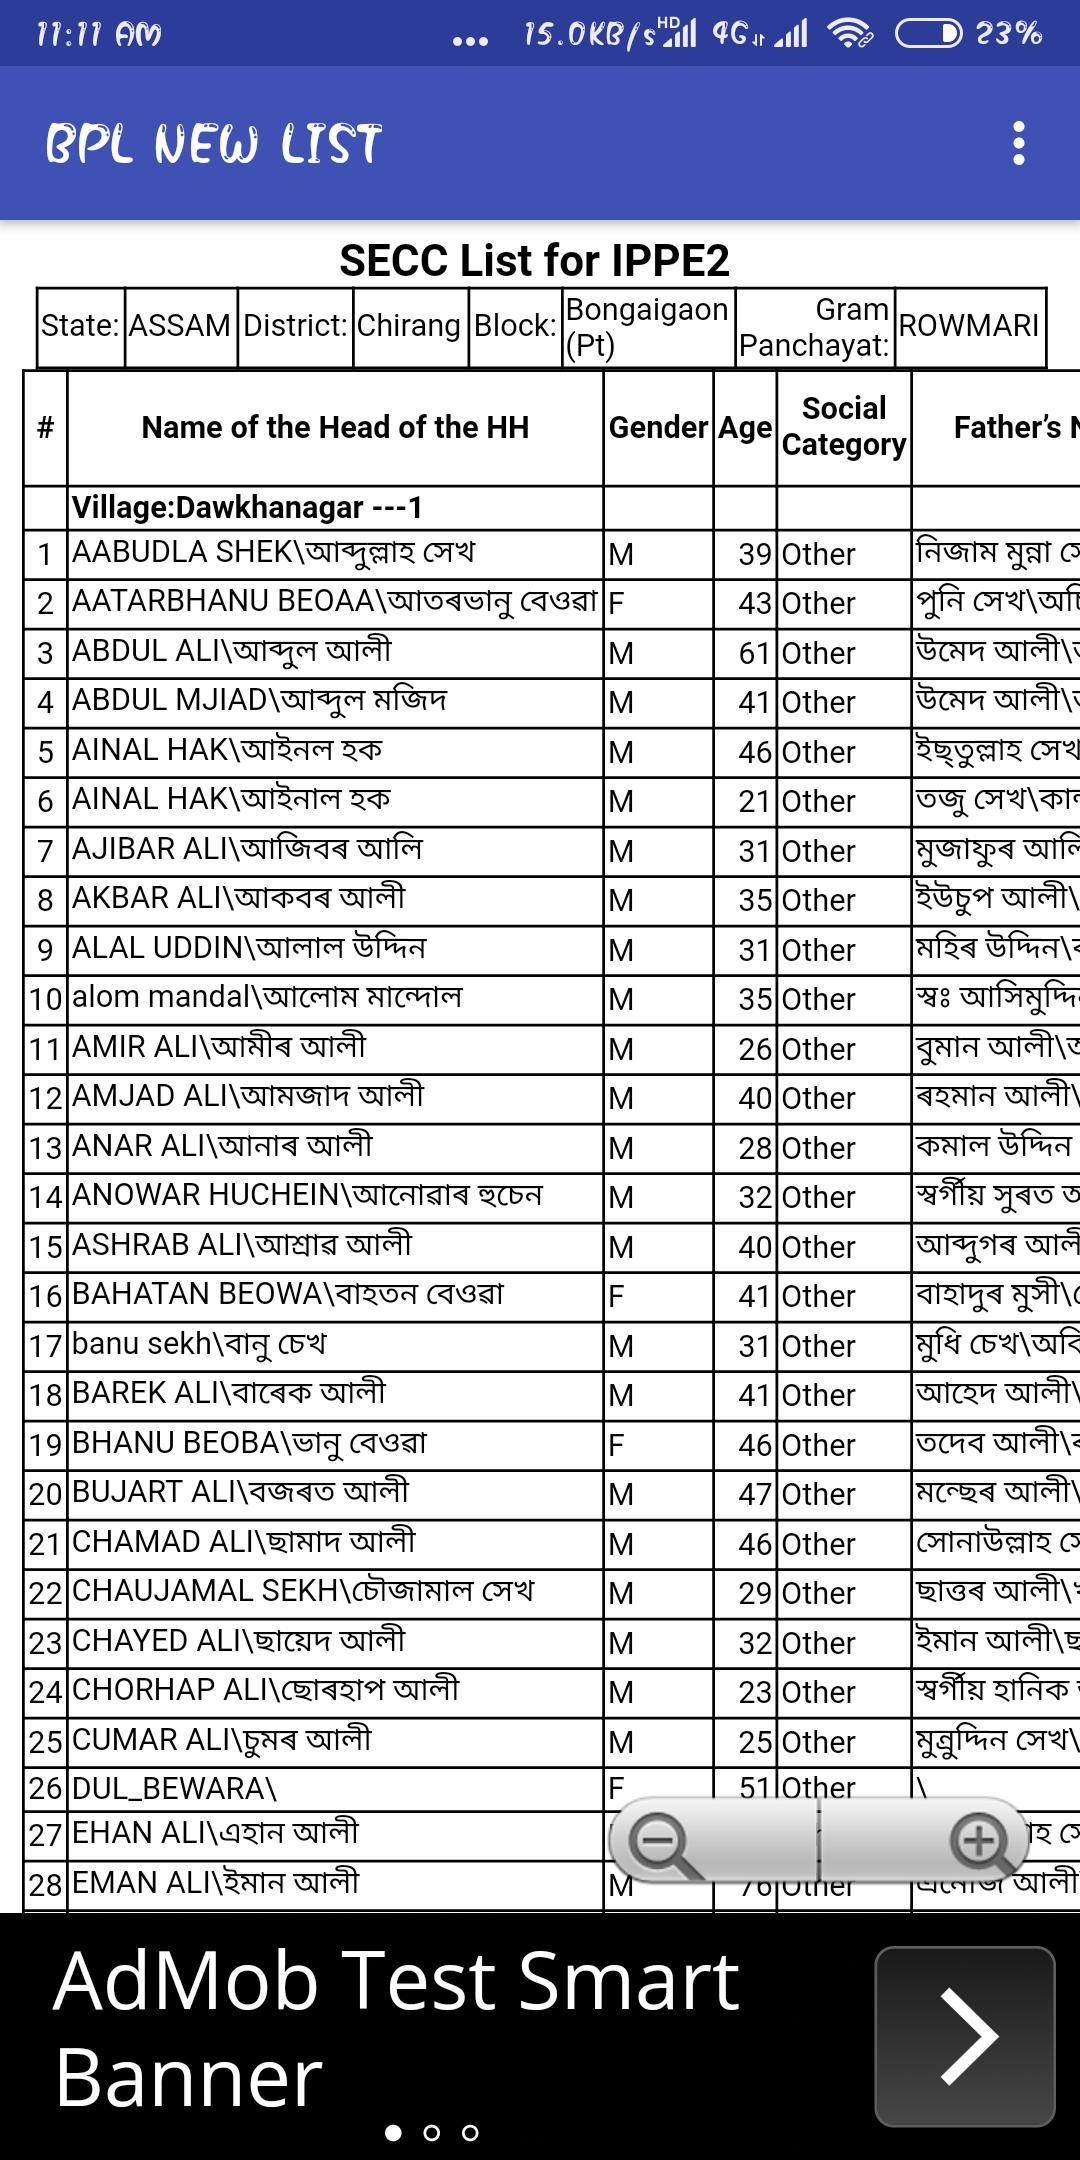 Secc List 2019